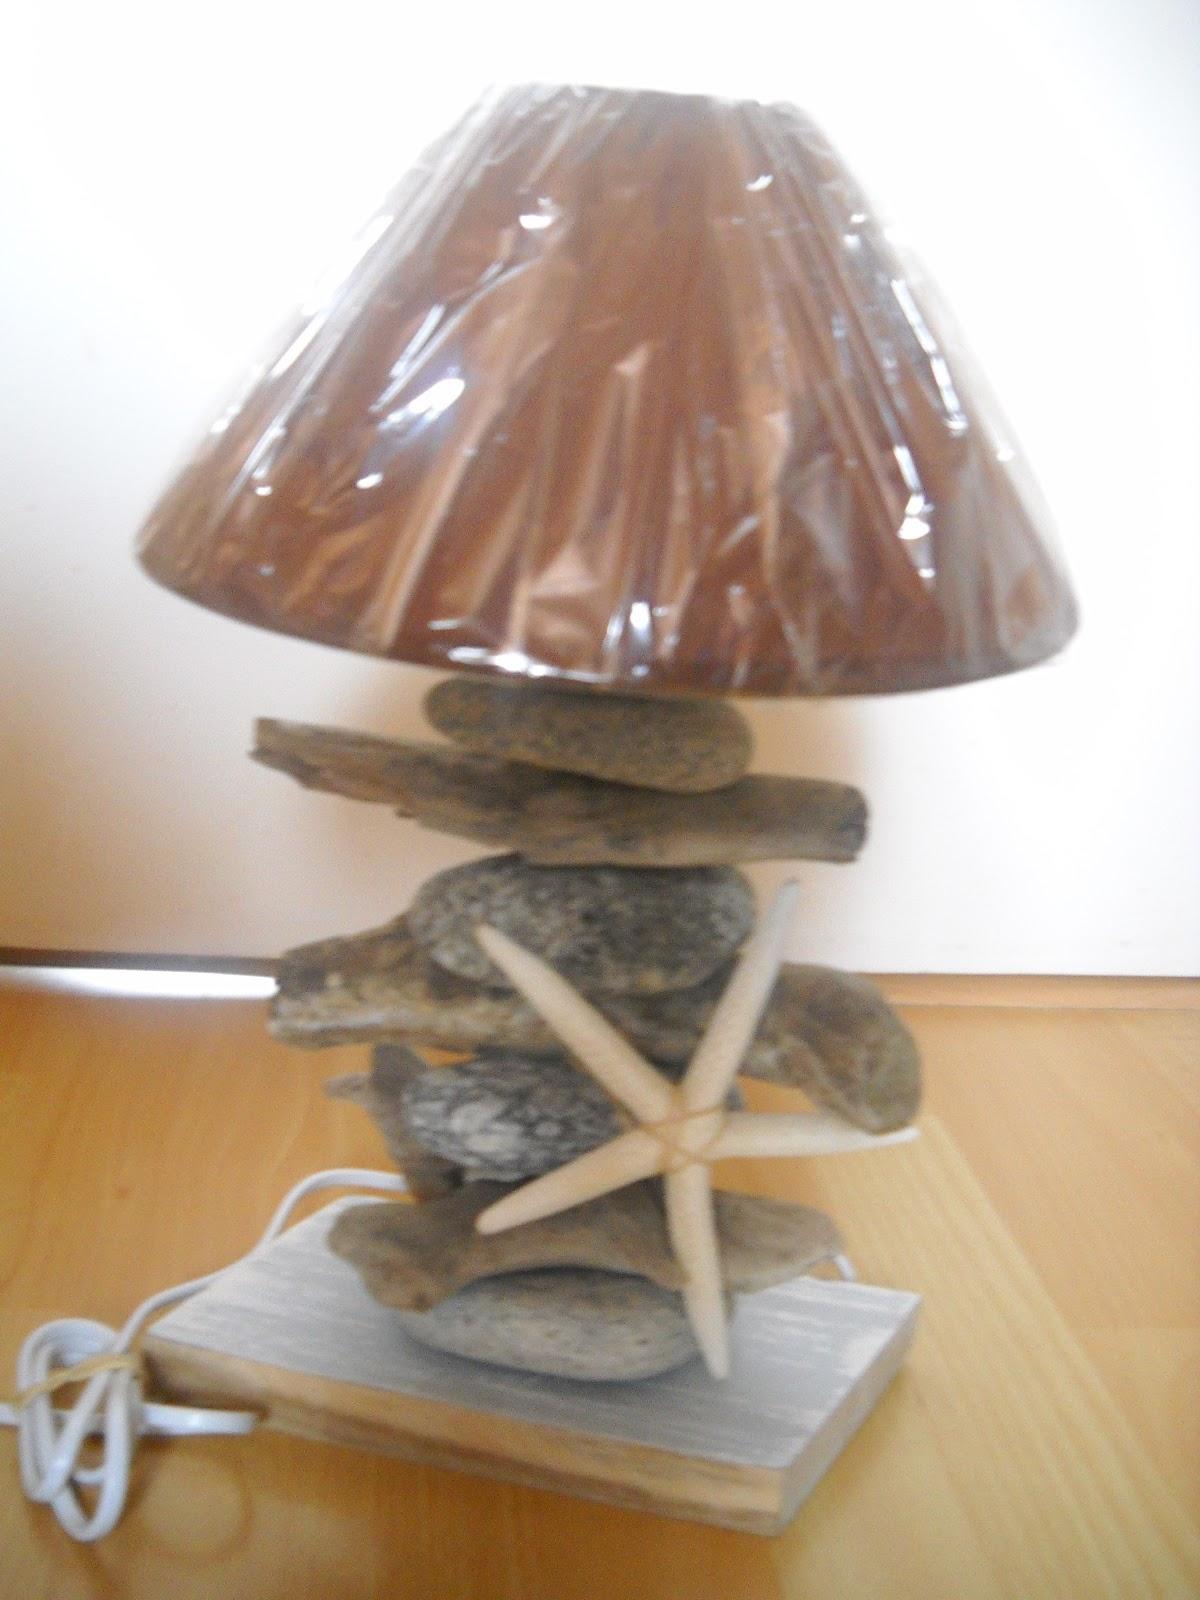 En voil des mati res for Lampe en bois flotte et galet